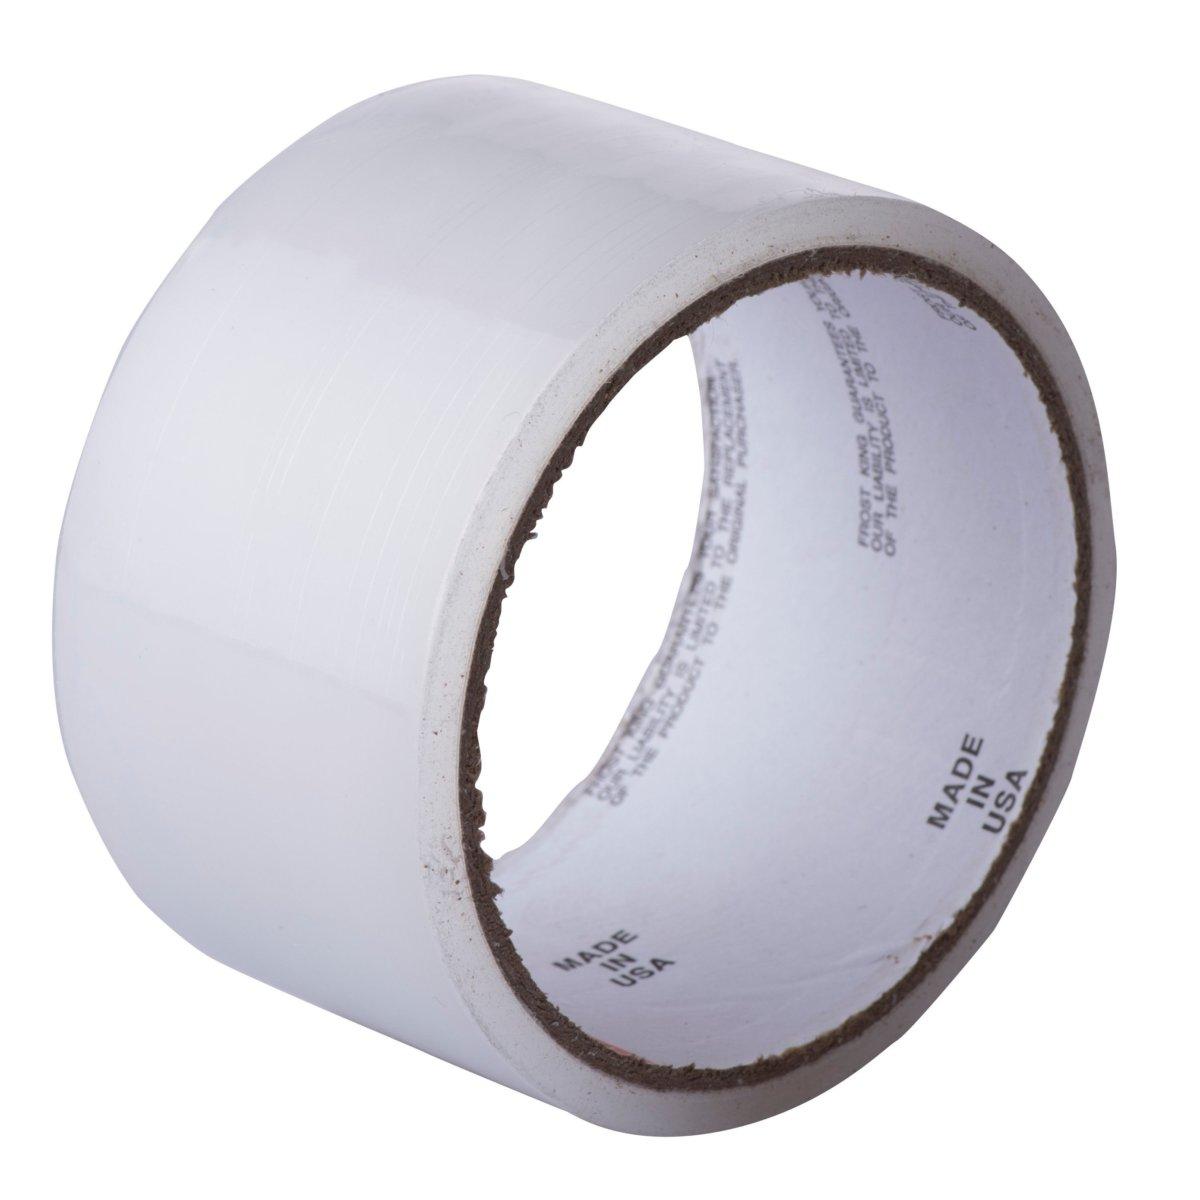 Draught Seal Tape